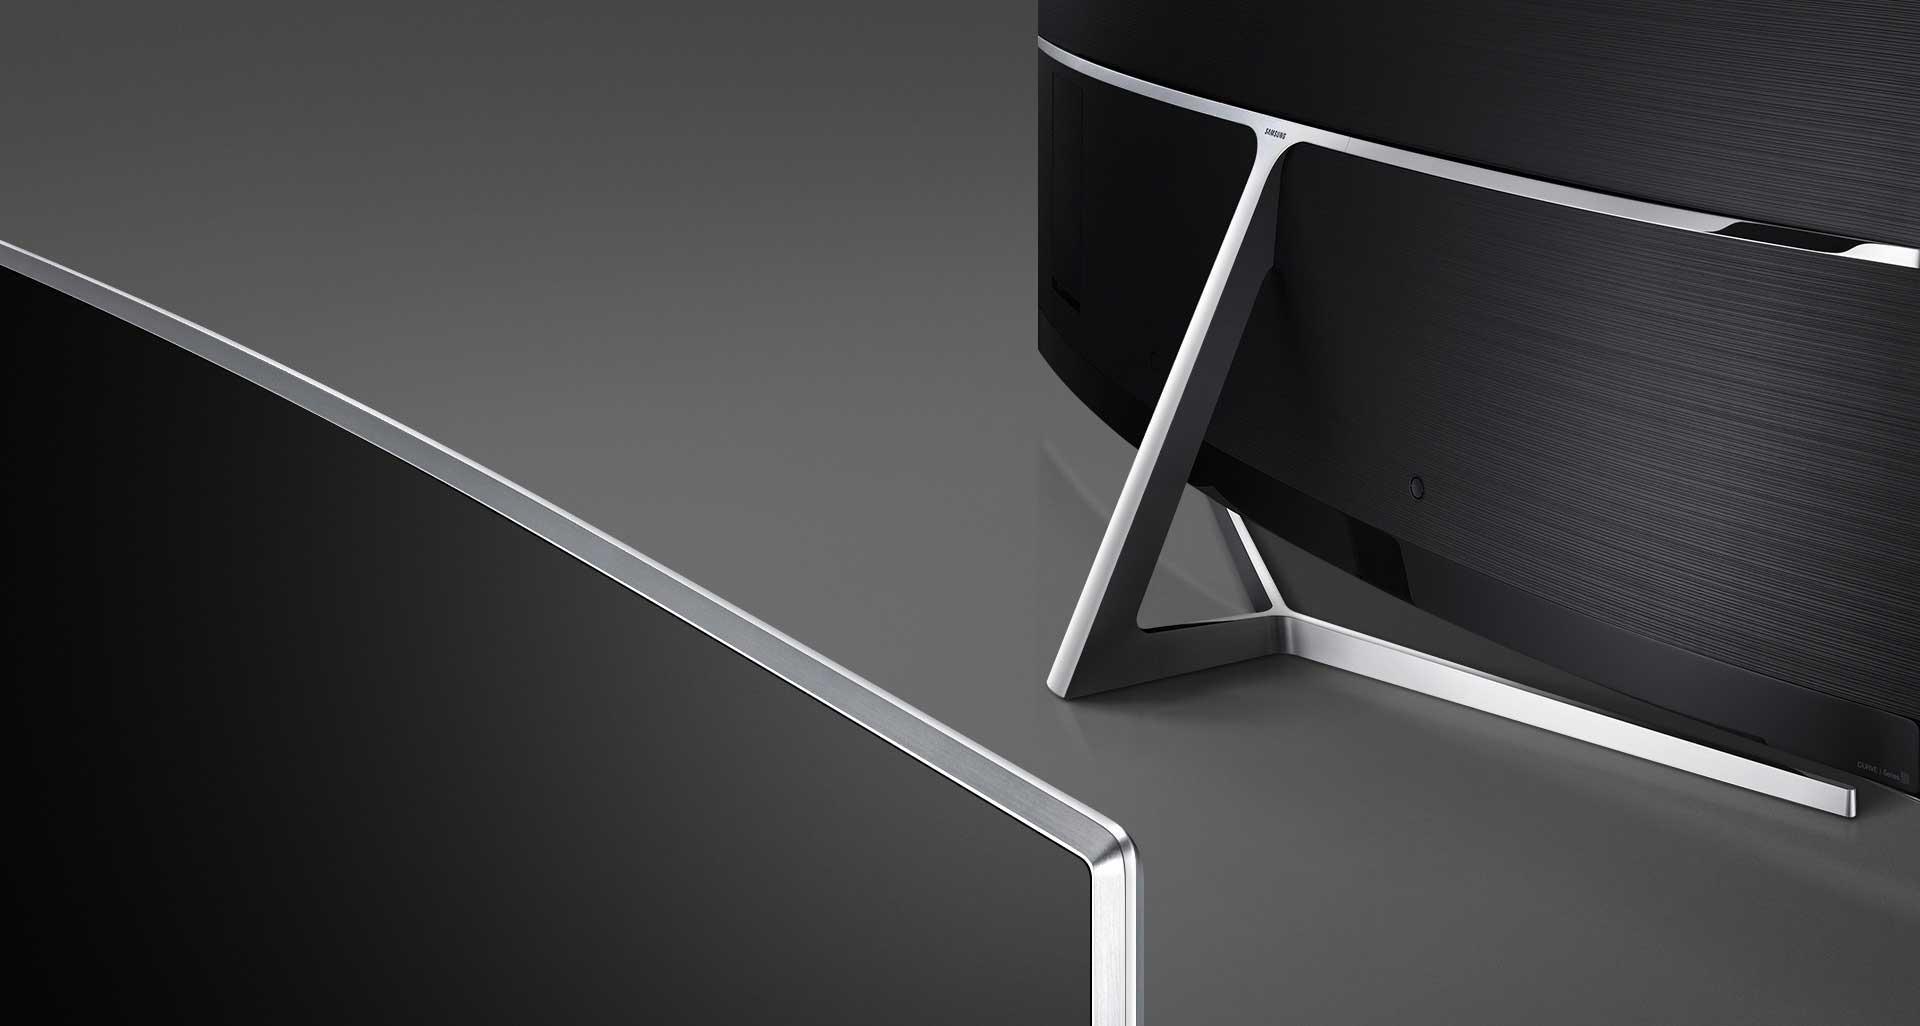 تلویزیون ال ای دی منحنی سامسونگ 55 اینچ سری 9 اسمارت KS9995